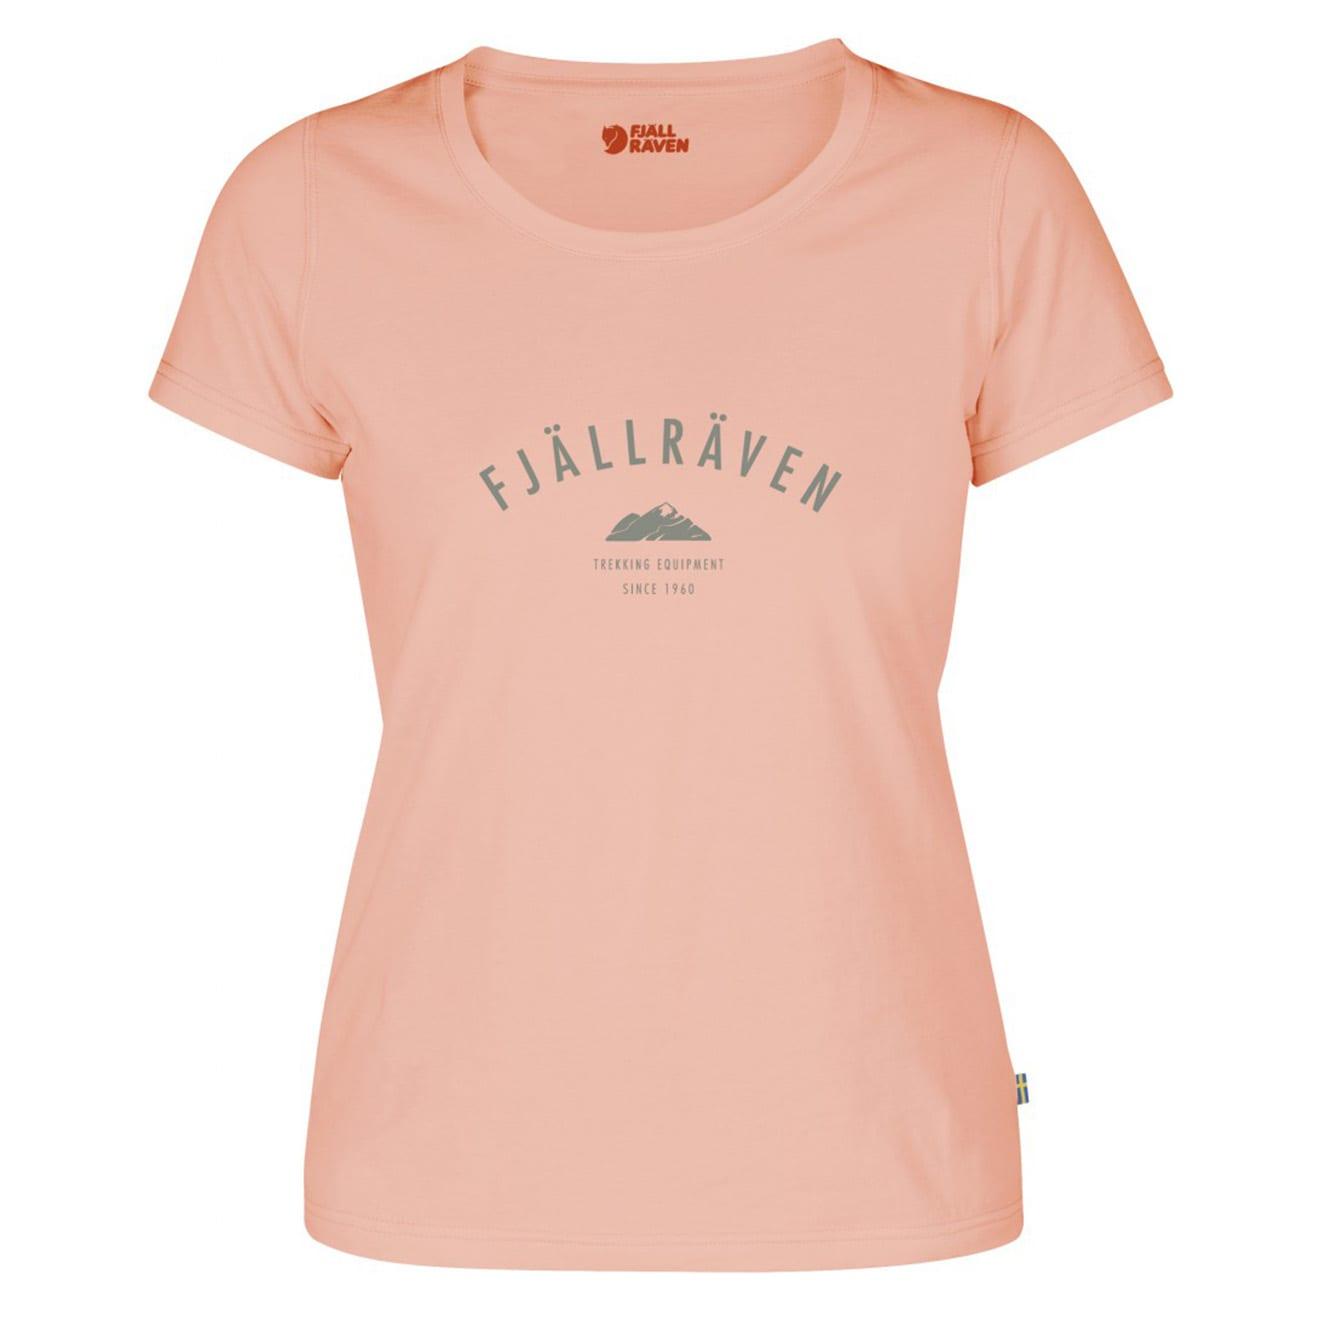 Fjallraven Womens Trekking Equipment T-Shirt Lily